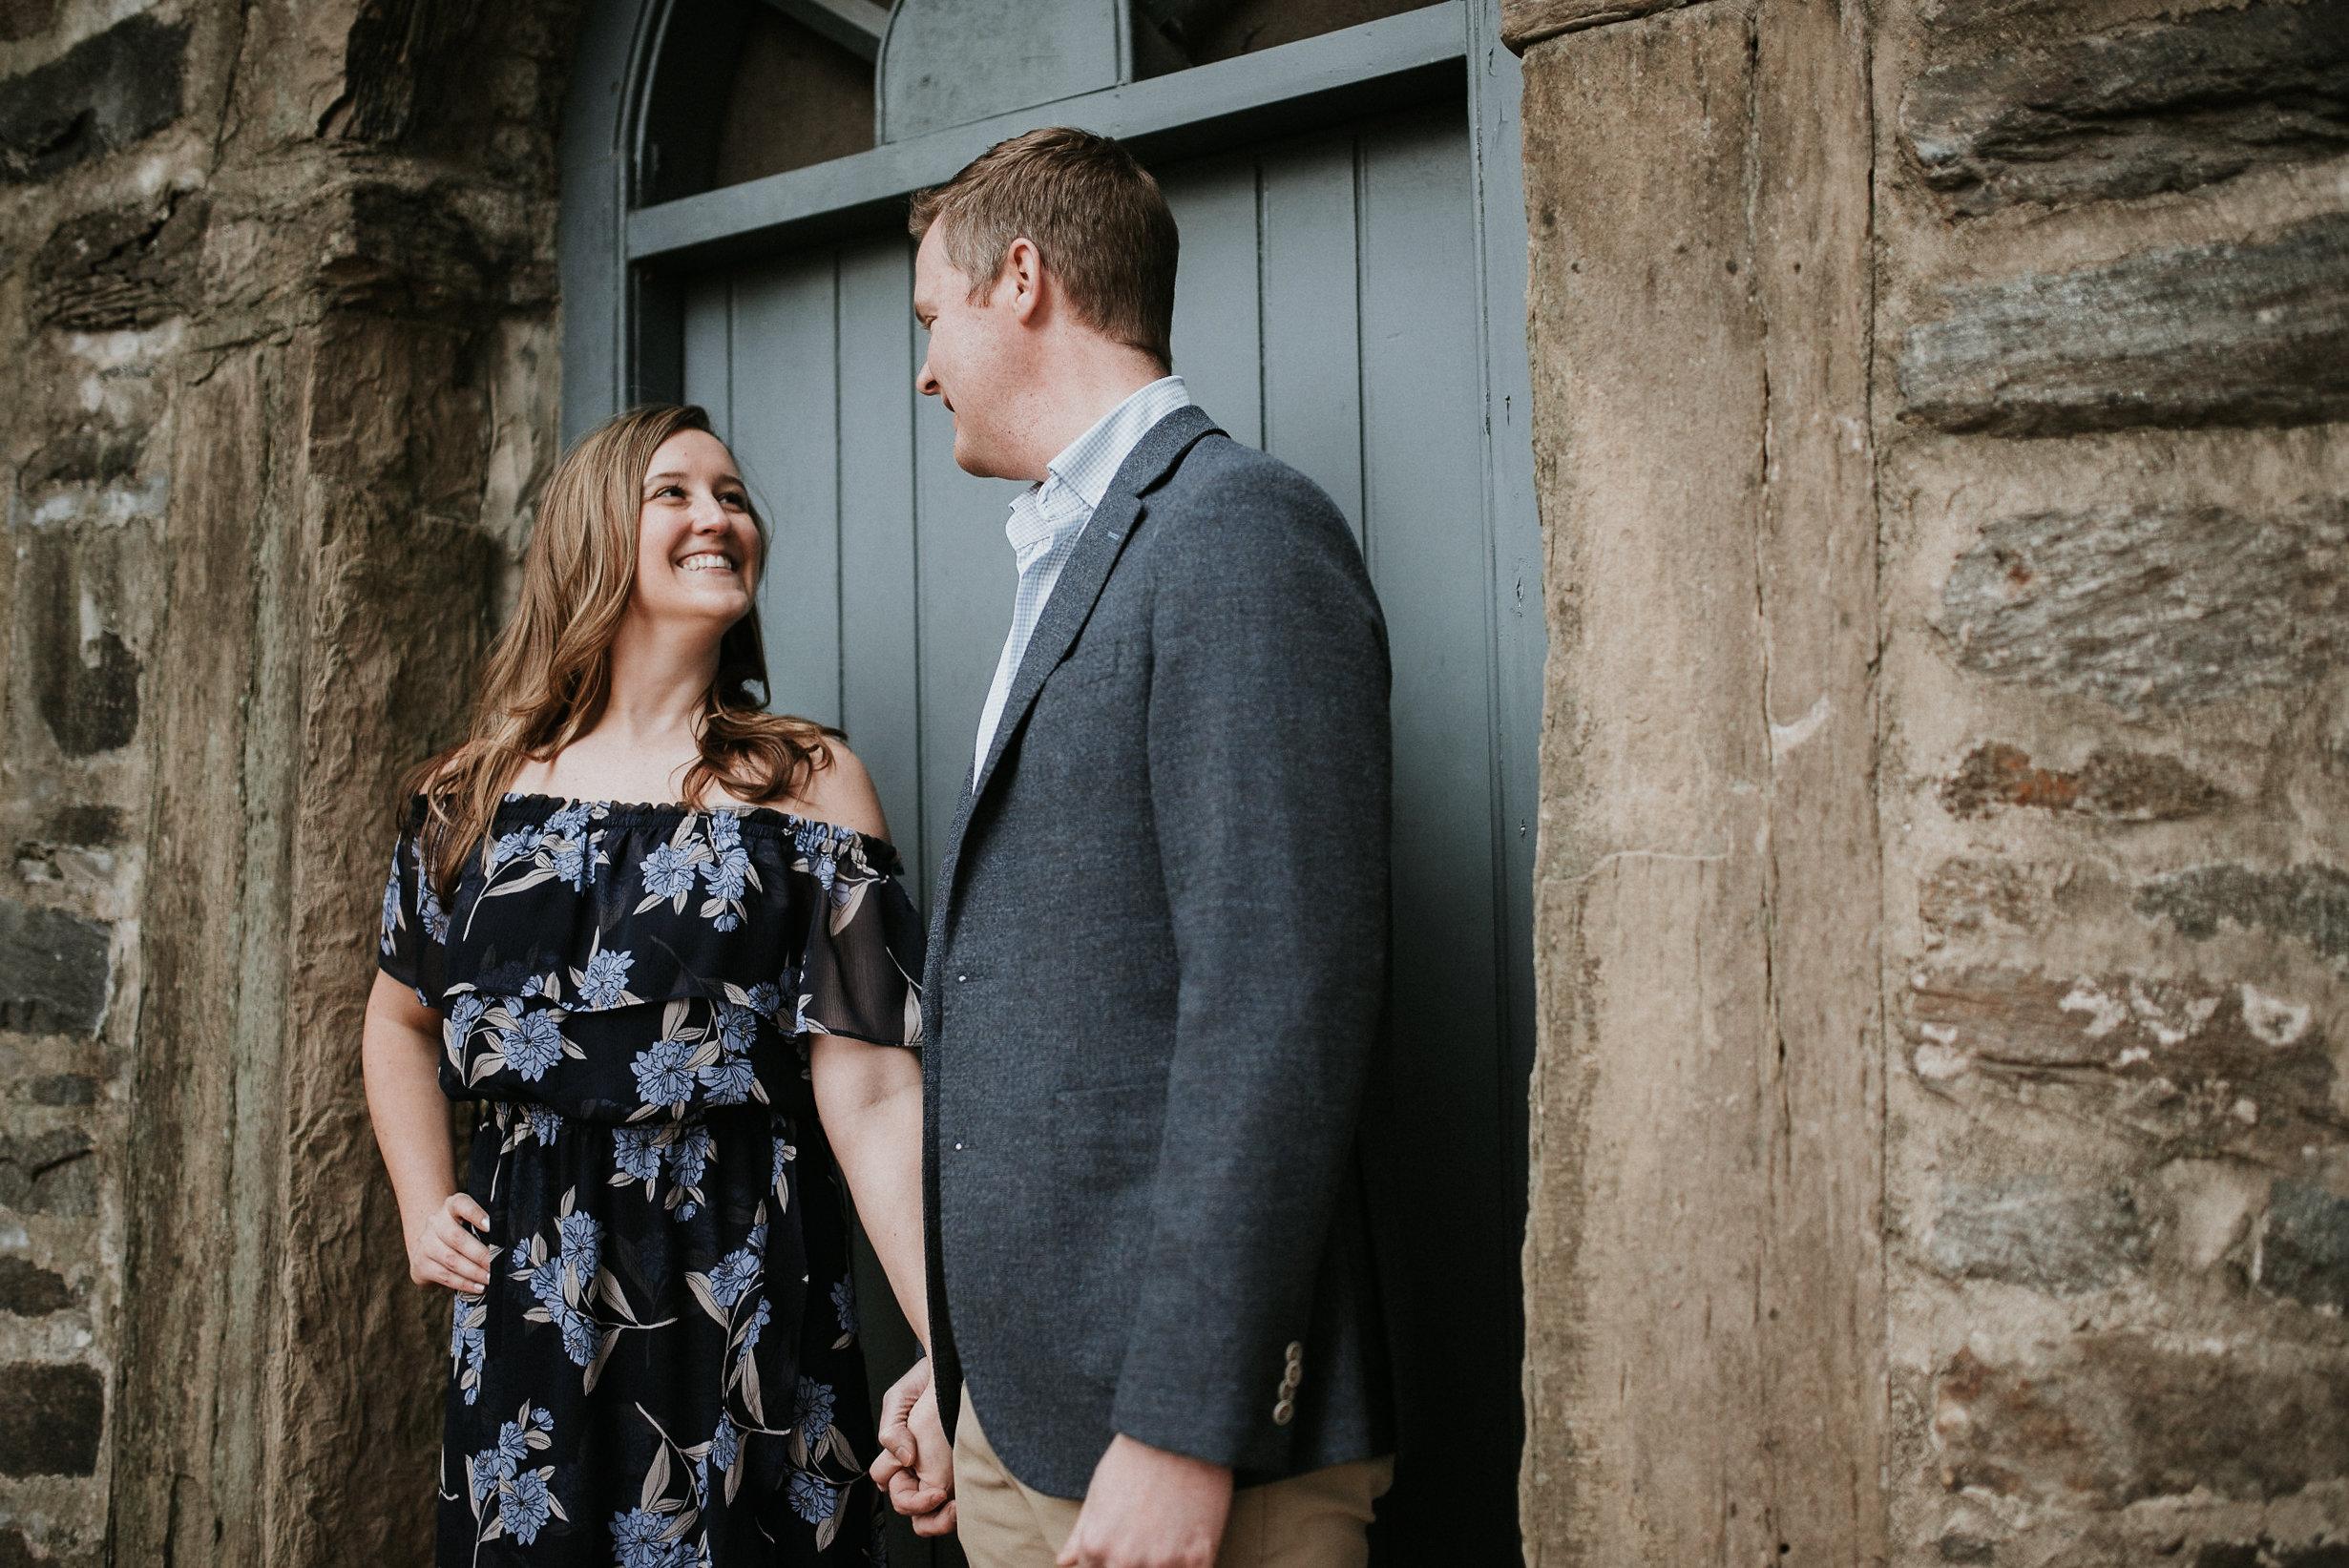 Woman smiling at man in doorway